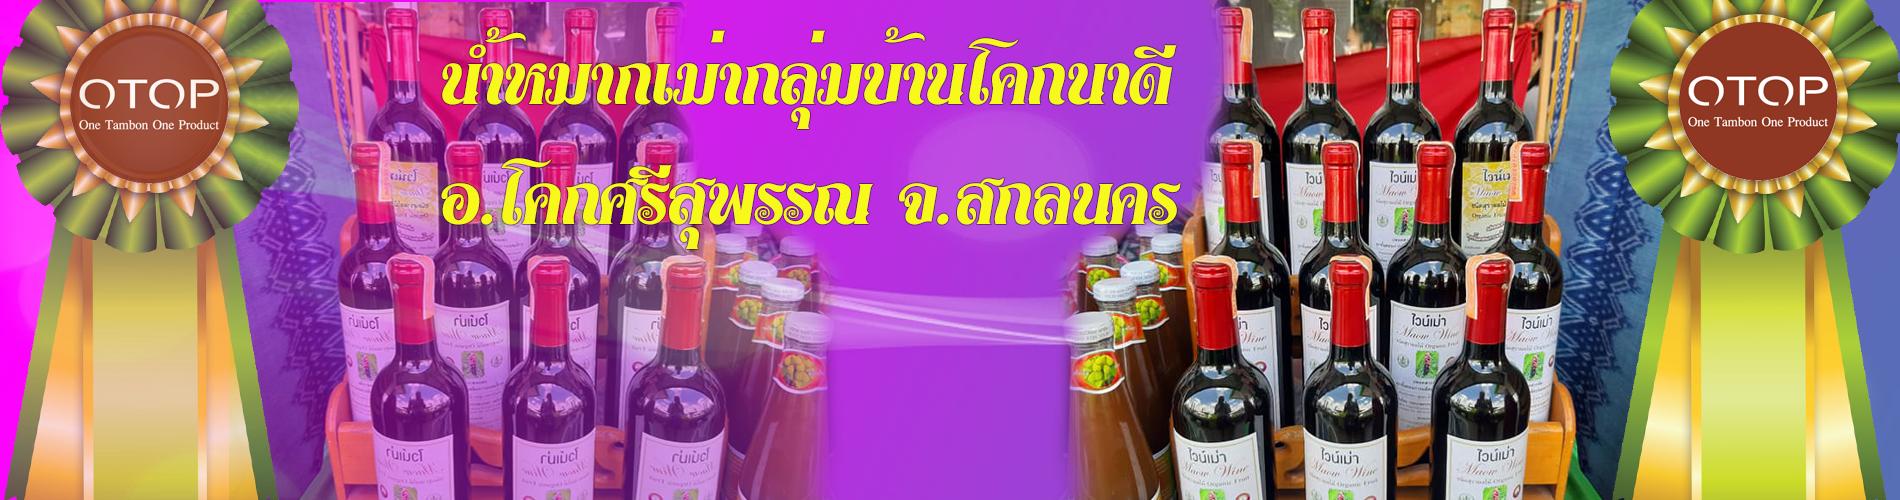 winemaokhoknadee